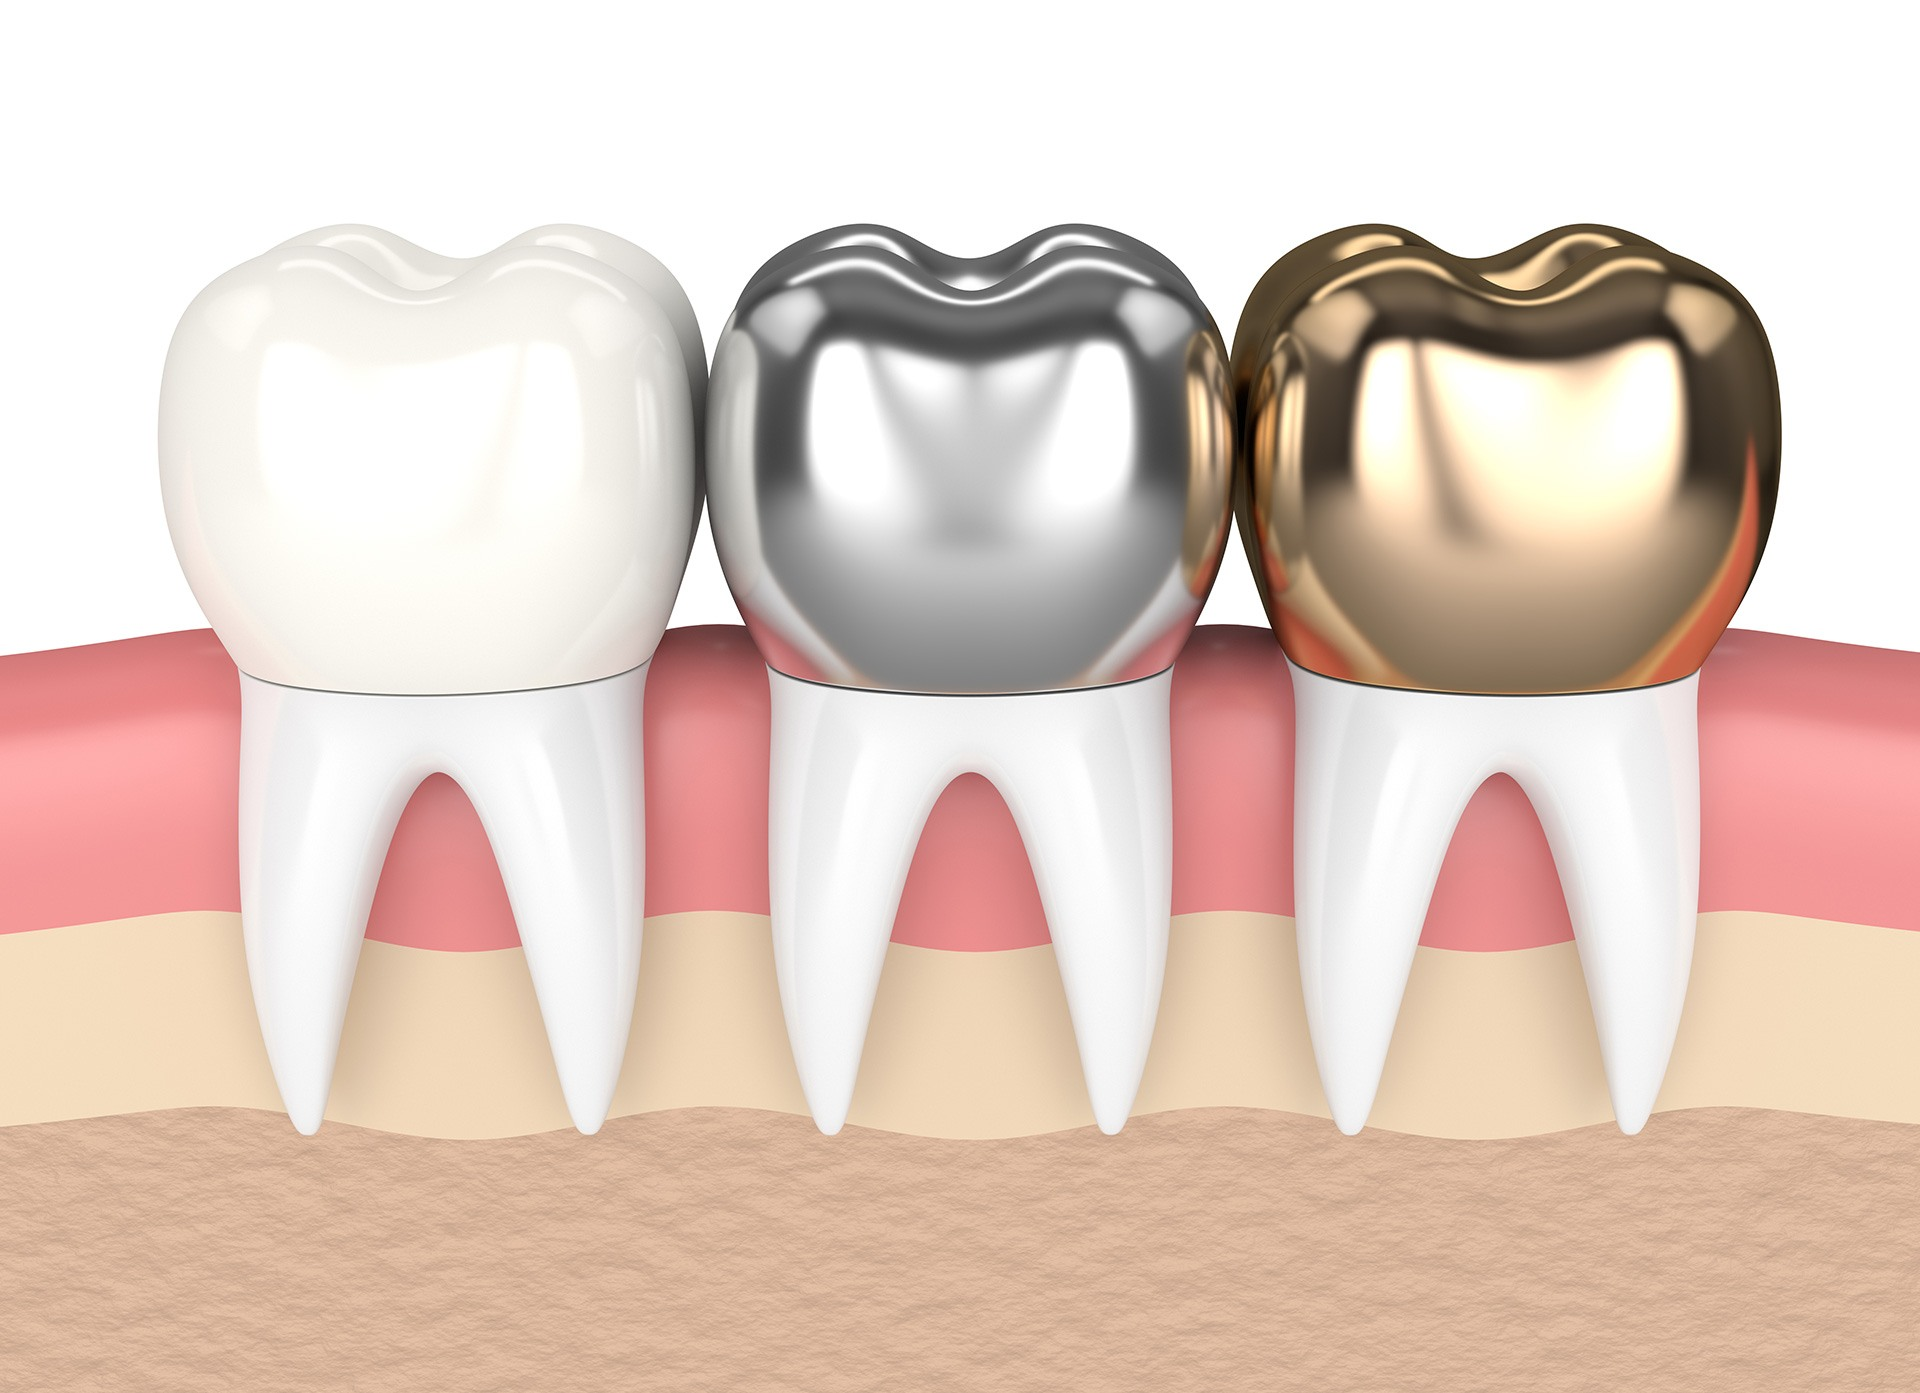 Håll din tand stil med kvalitets tandsmycken på TandCity